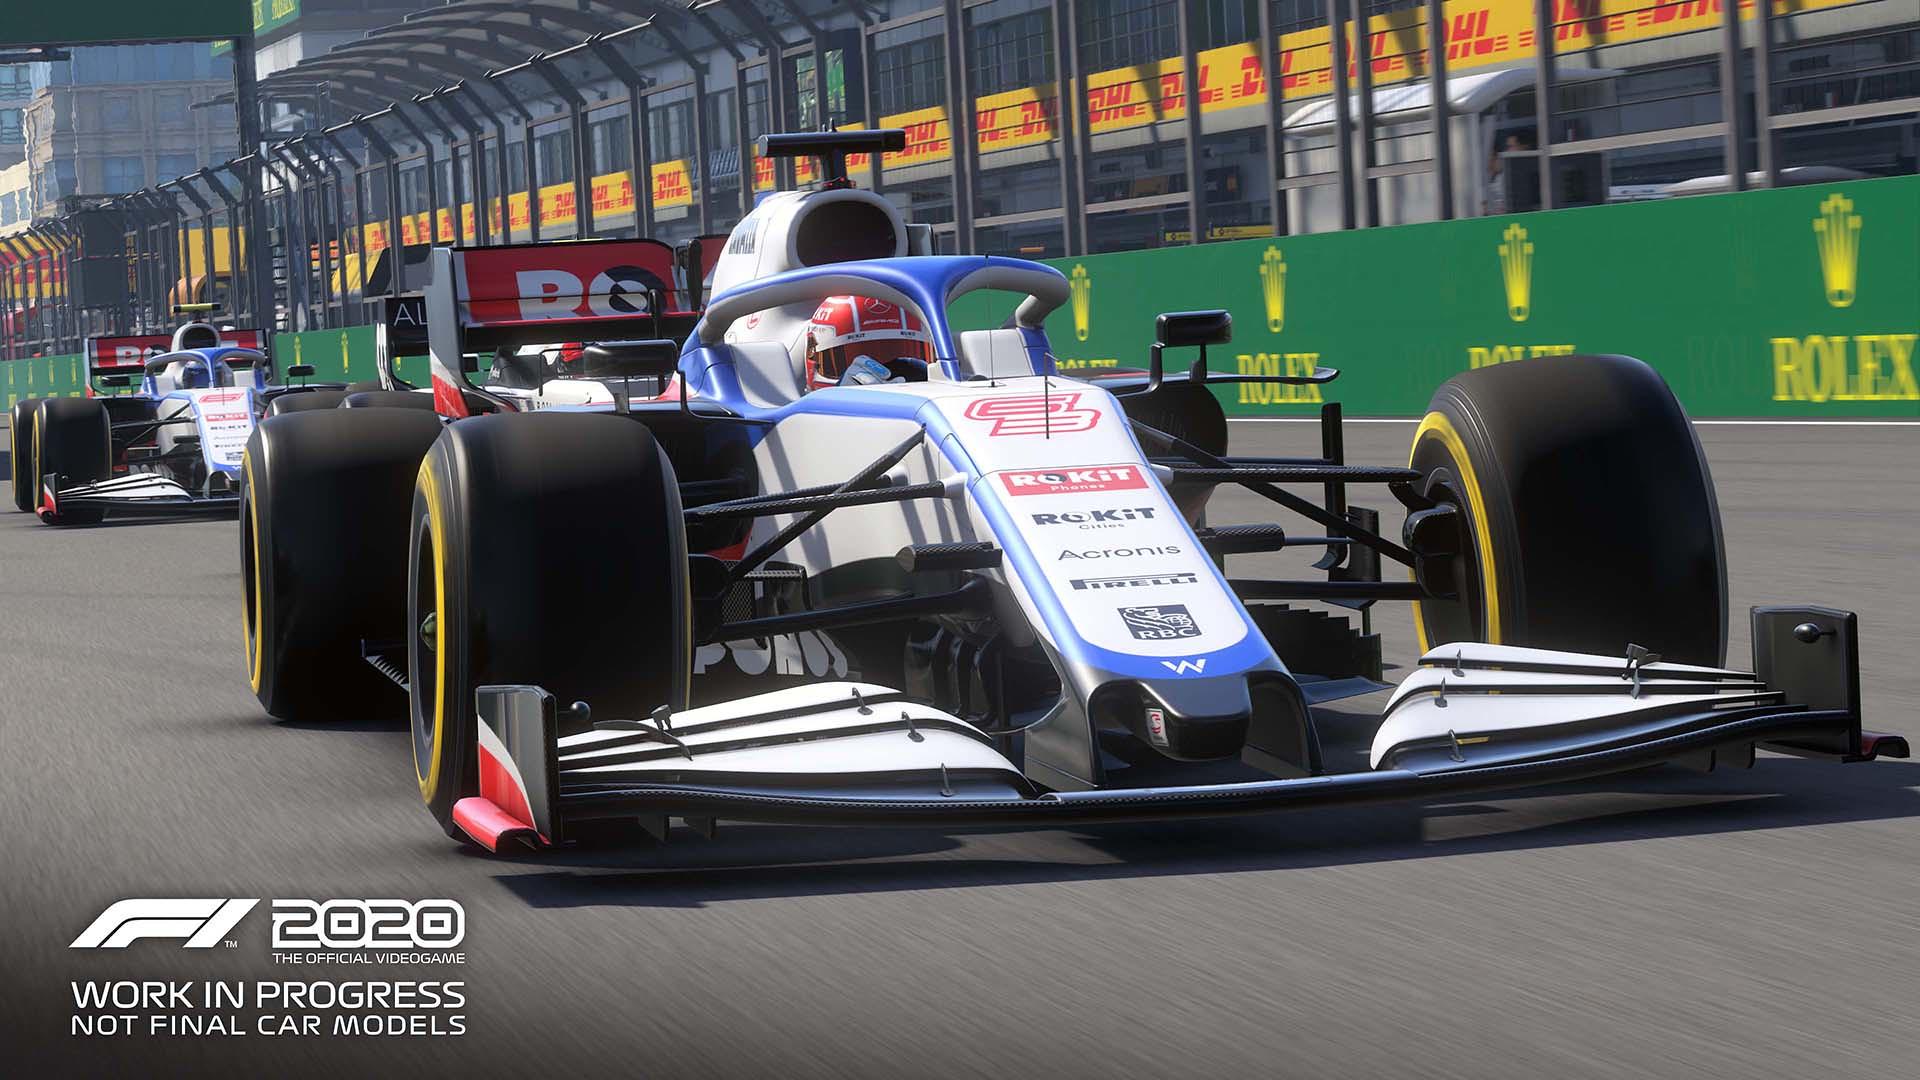 Plenty Of New F1 2020 Screenshots   VirtualR.net - 100% ...